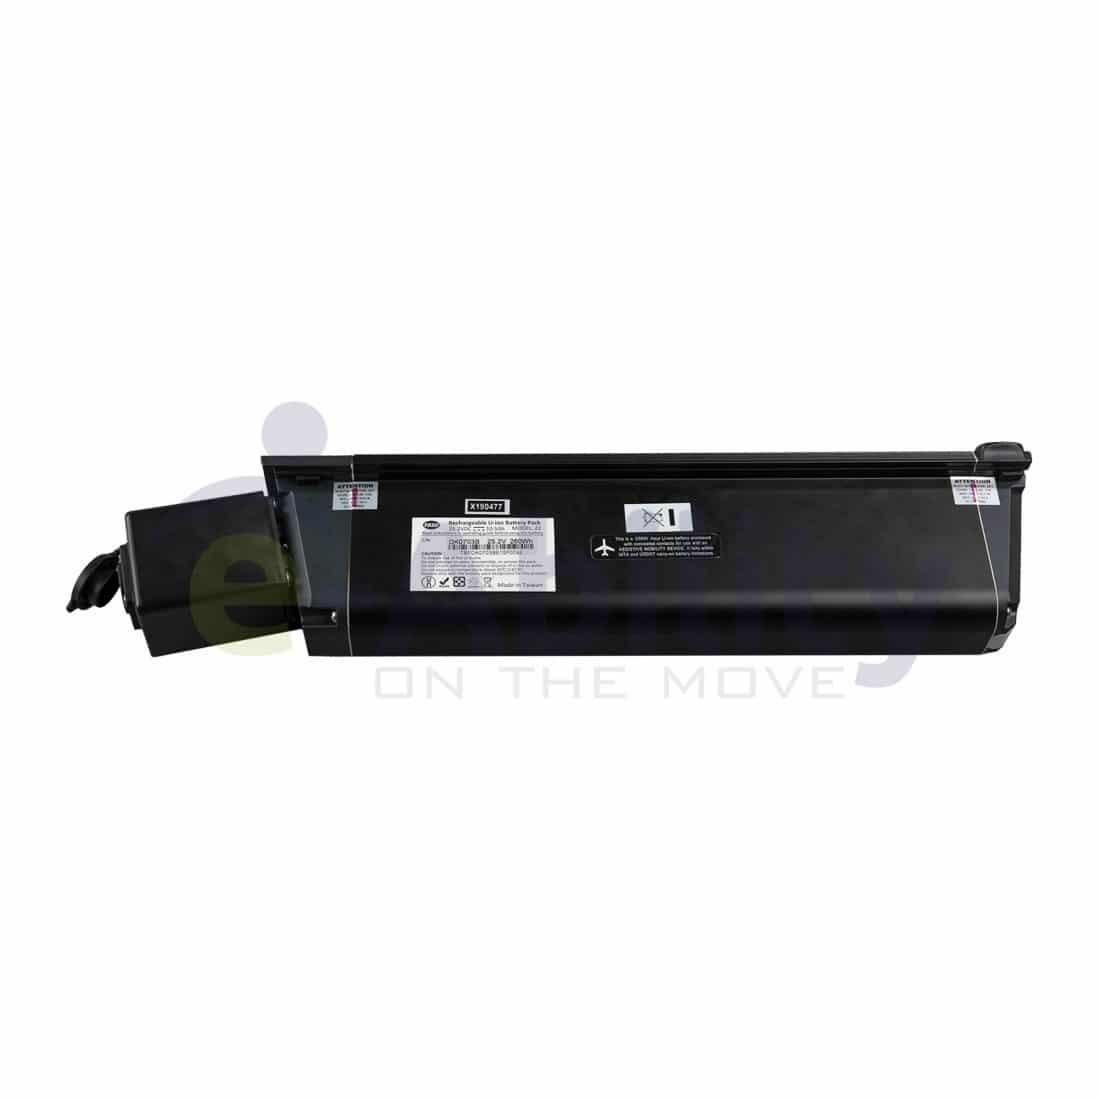 E Ability Joyrider Oplaadadapter Rolstoel Accessoire